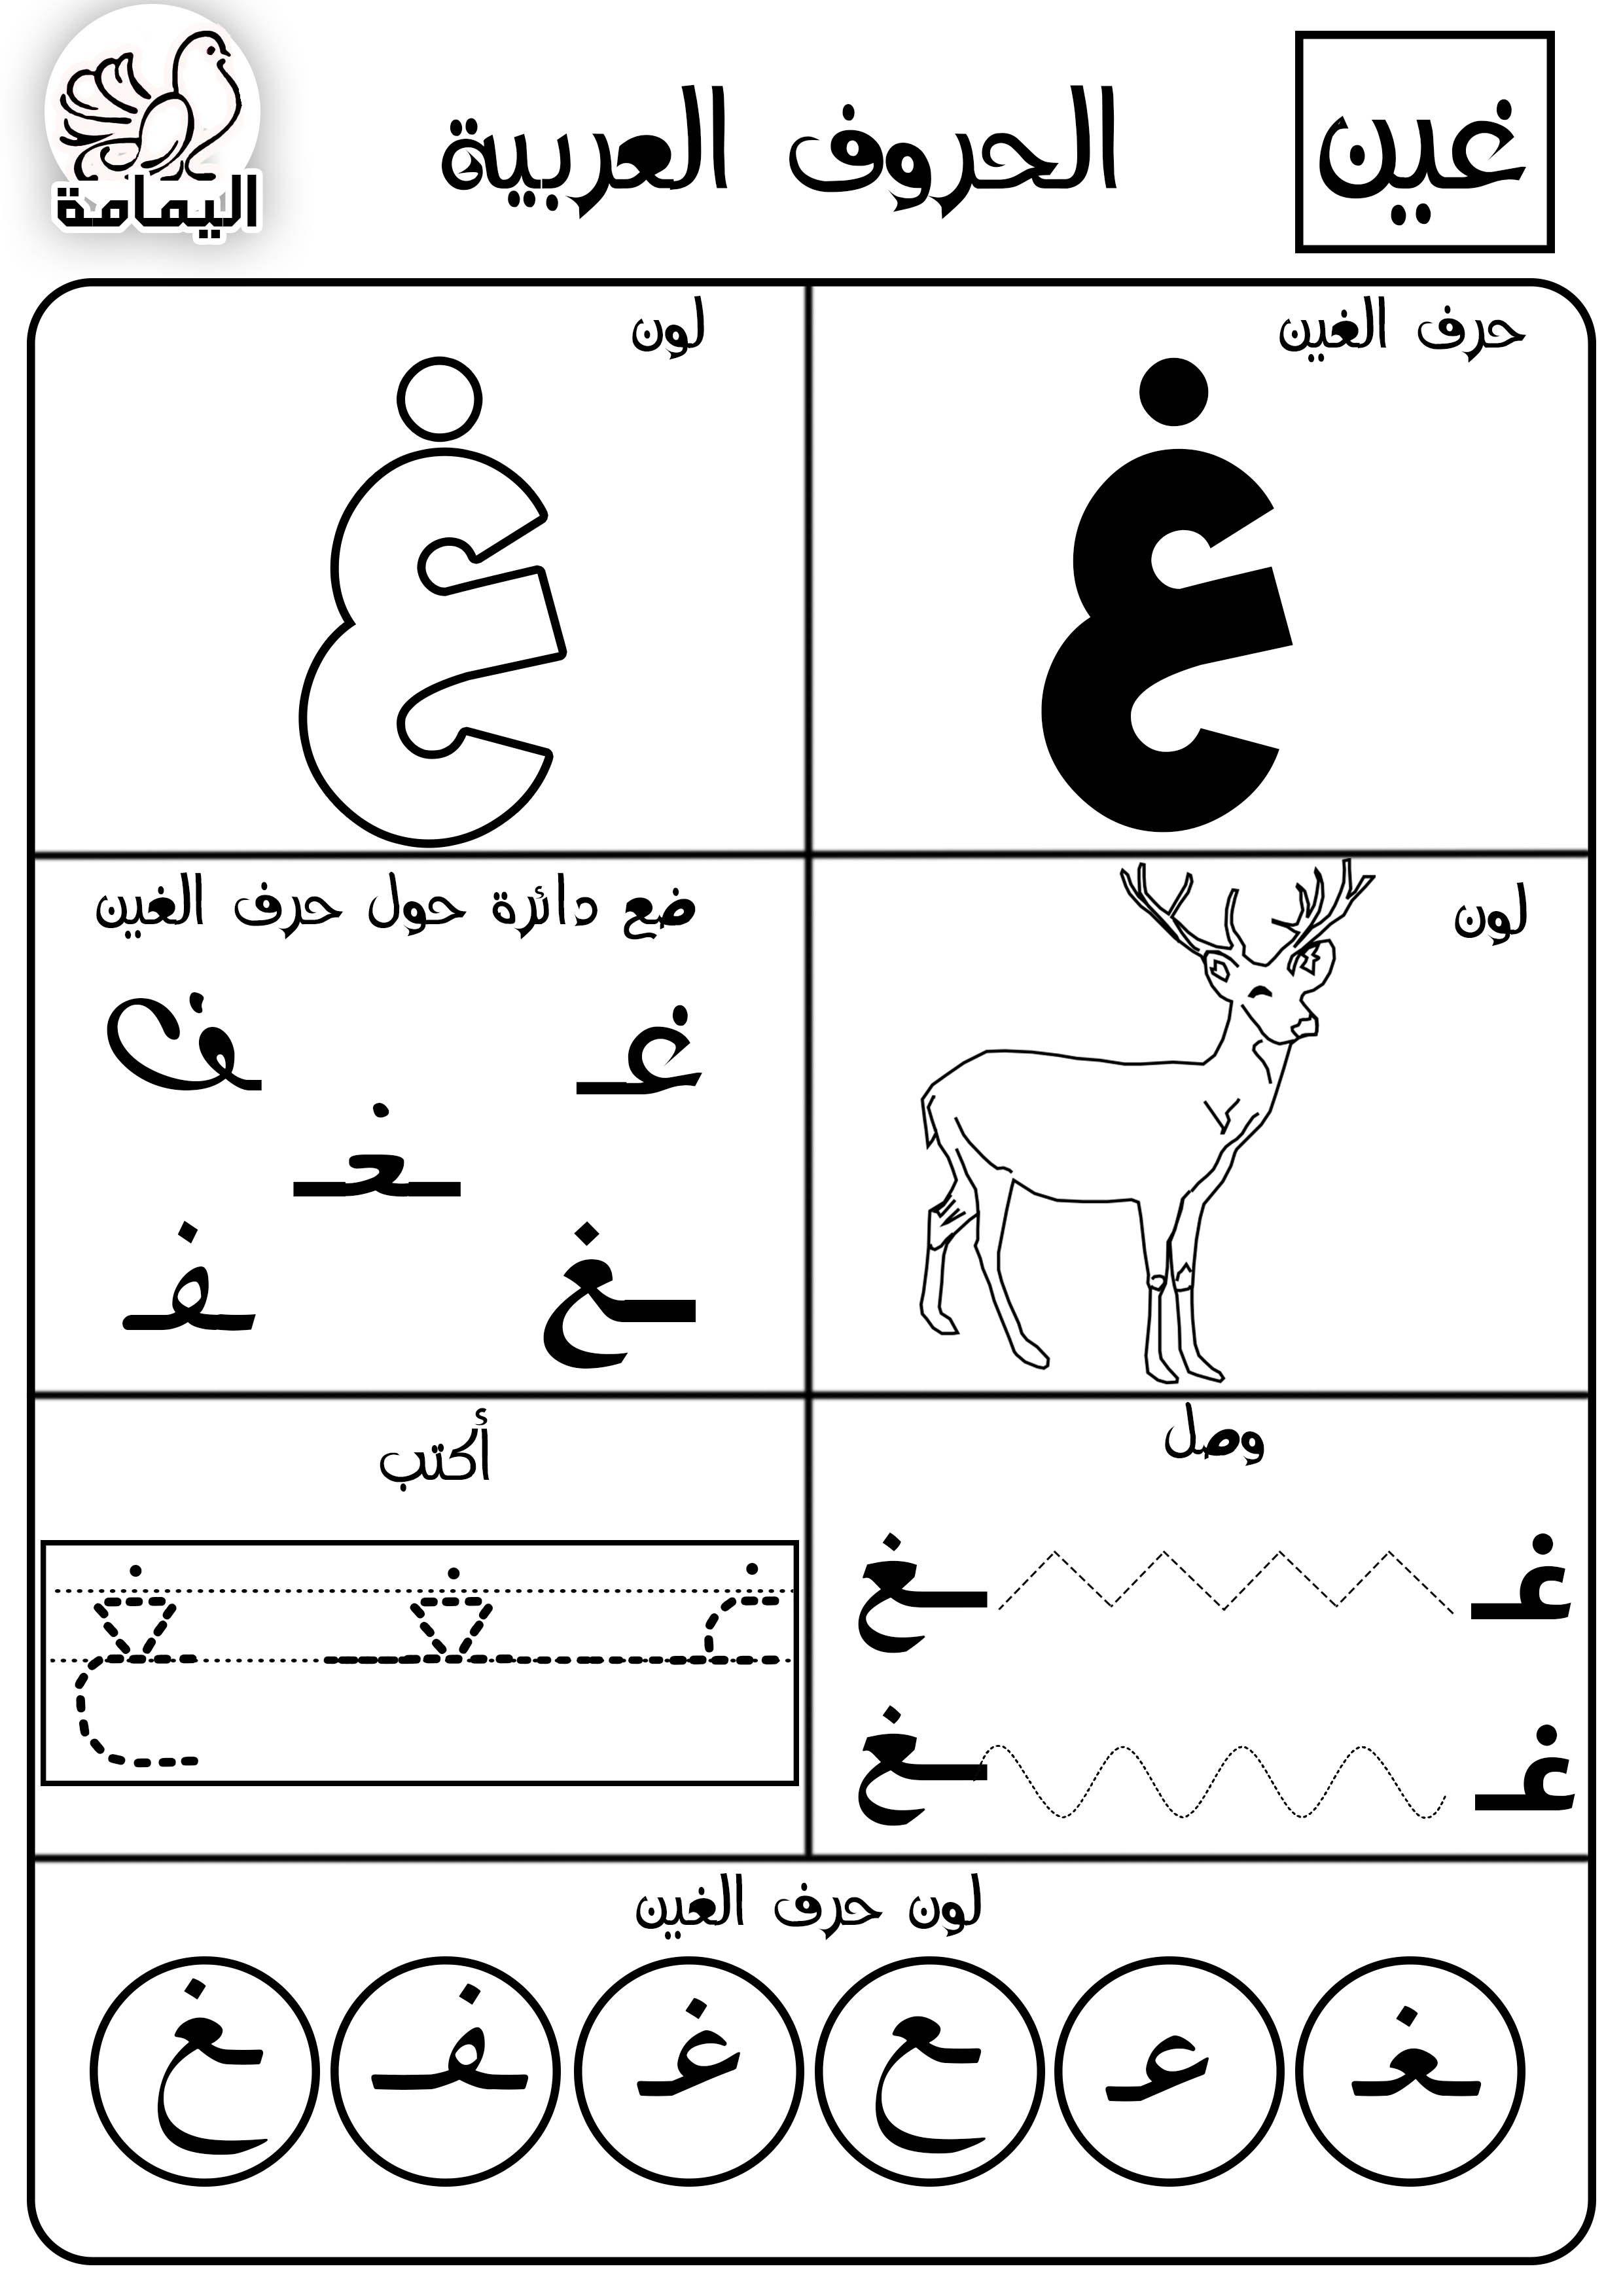 ArabicAlphabetWritten. ArabicAlphabetWritten